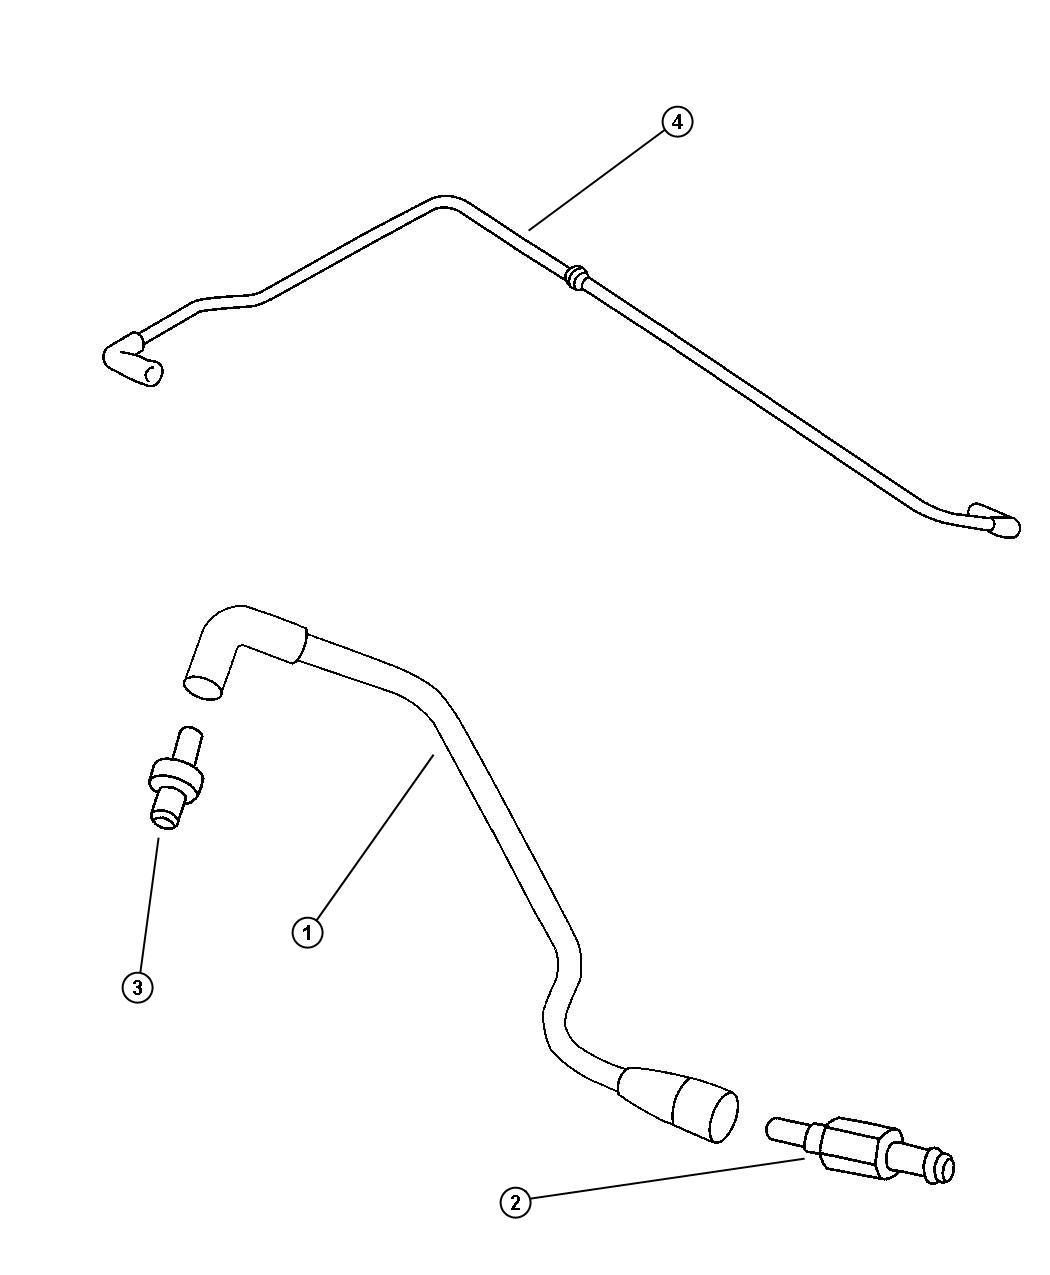 chrysler pt cruiser filter  crankcase vent  located in body  ech  ecb  cleaner